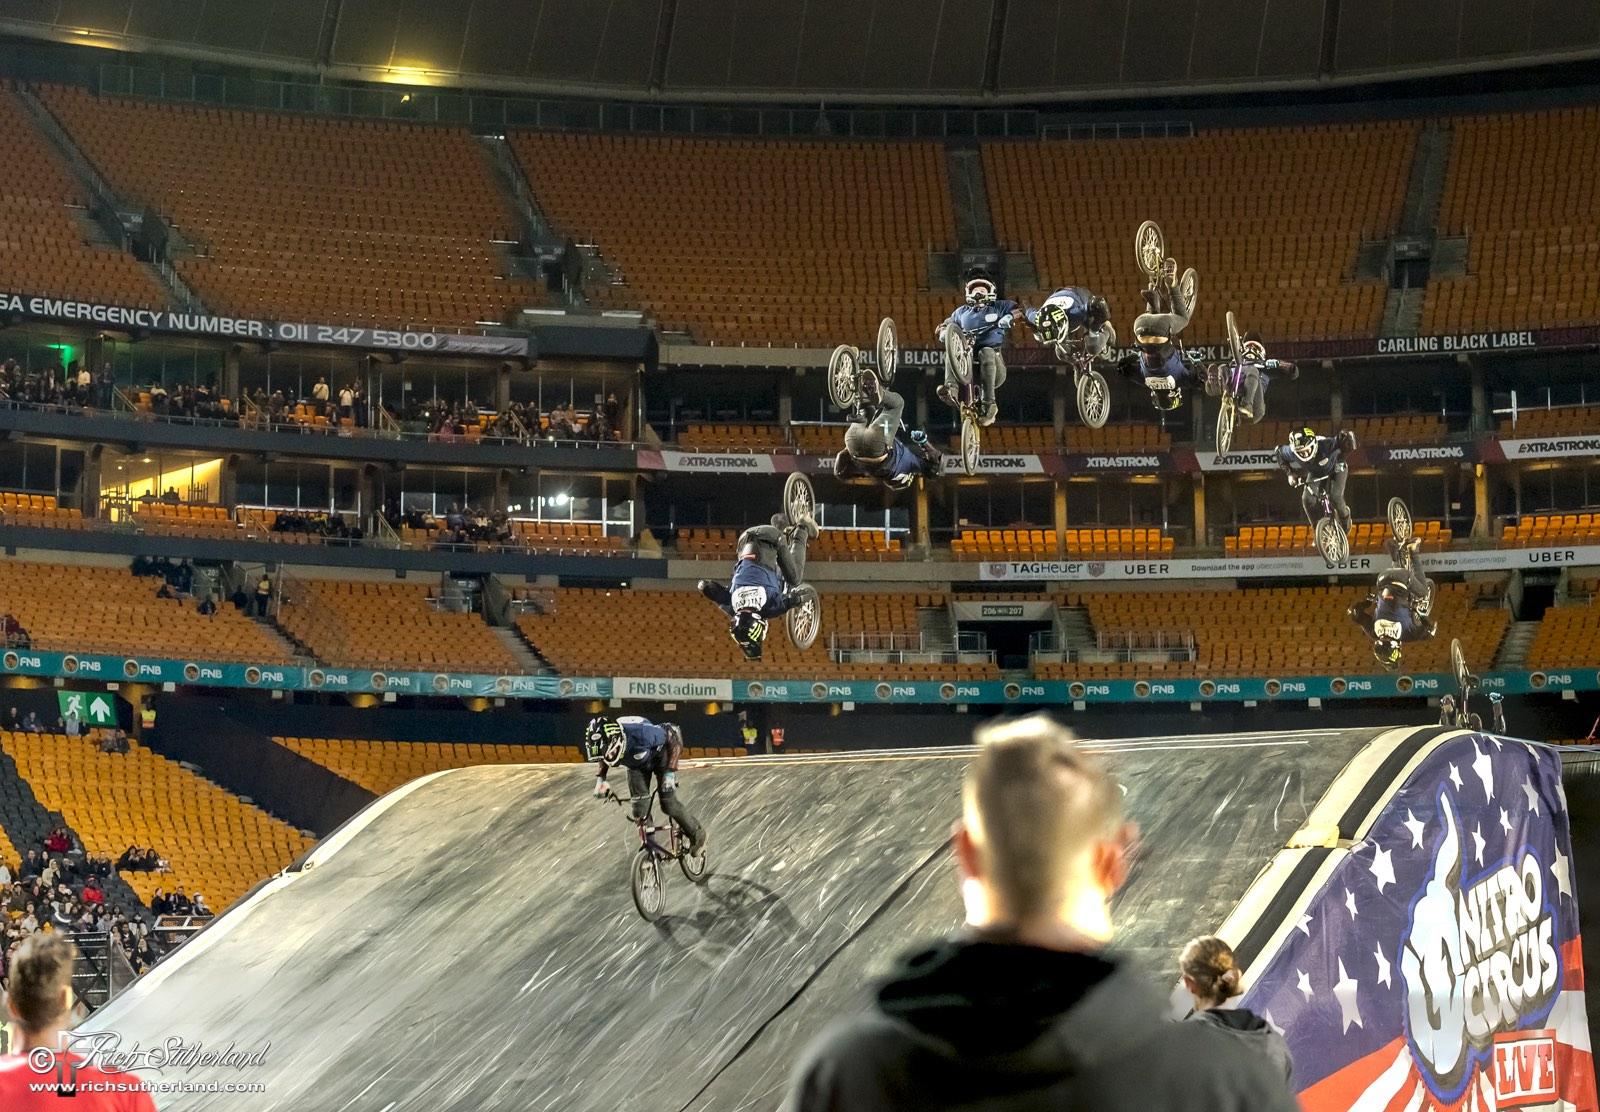 BMX rider James Foster landing a Triple Backflip at Nitro Circus Live